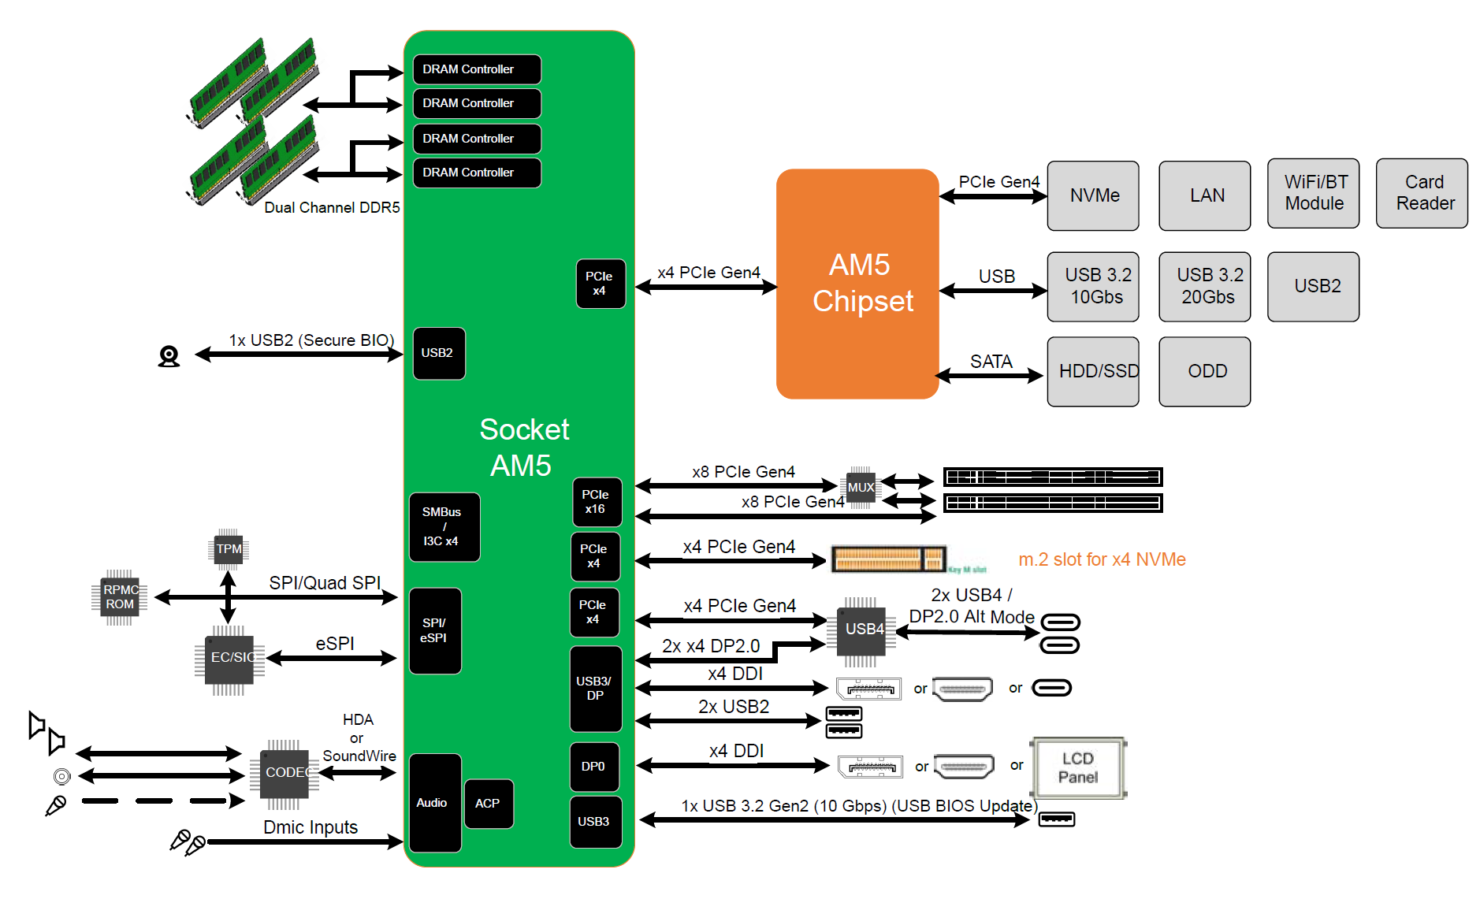 amd-am5-platform-block-diagram